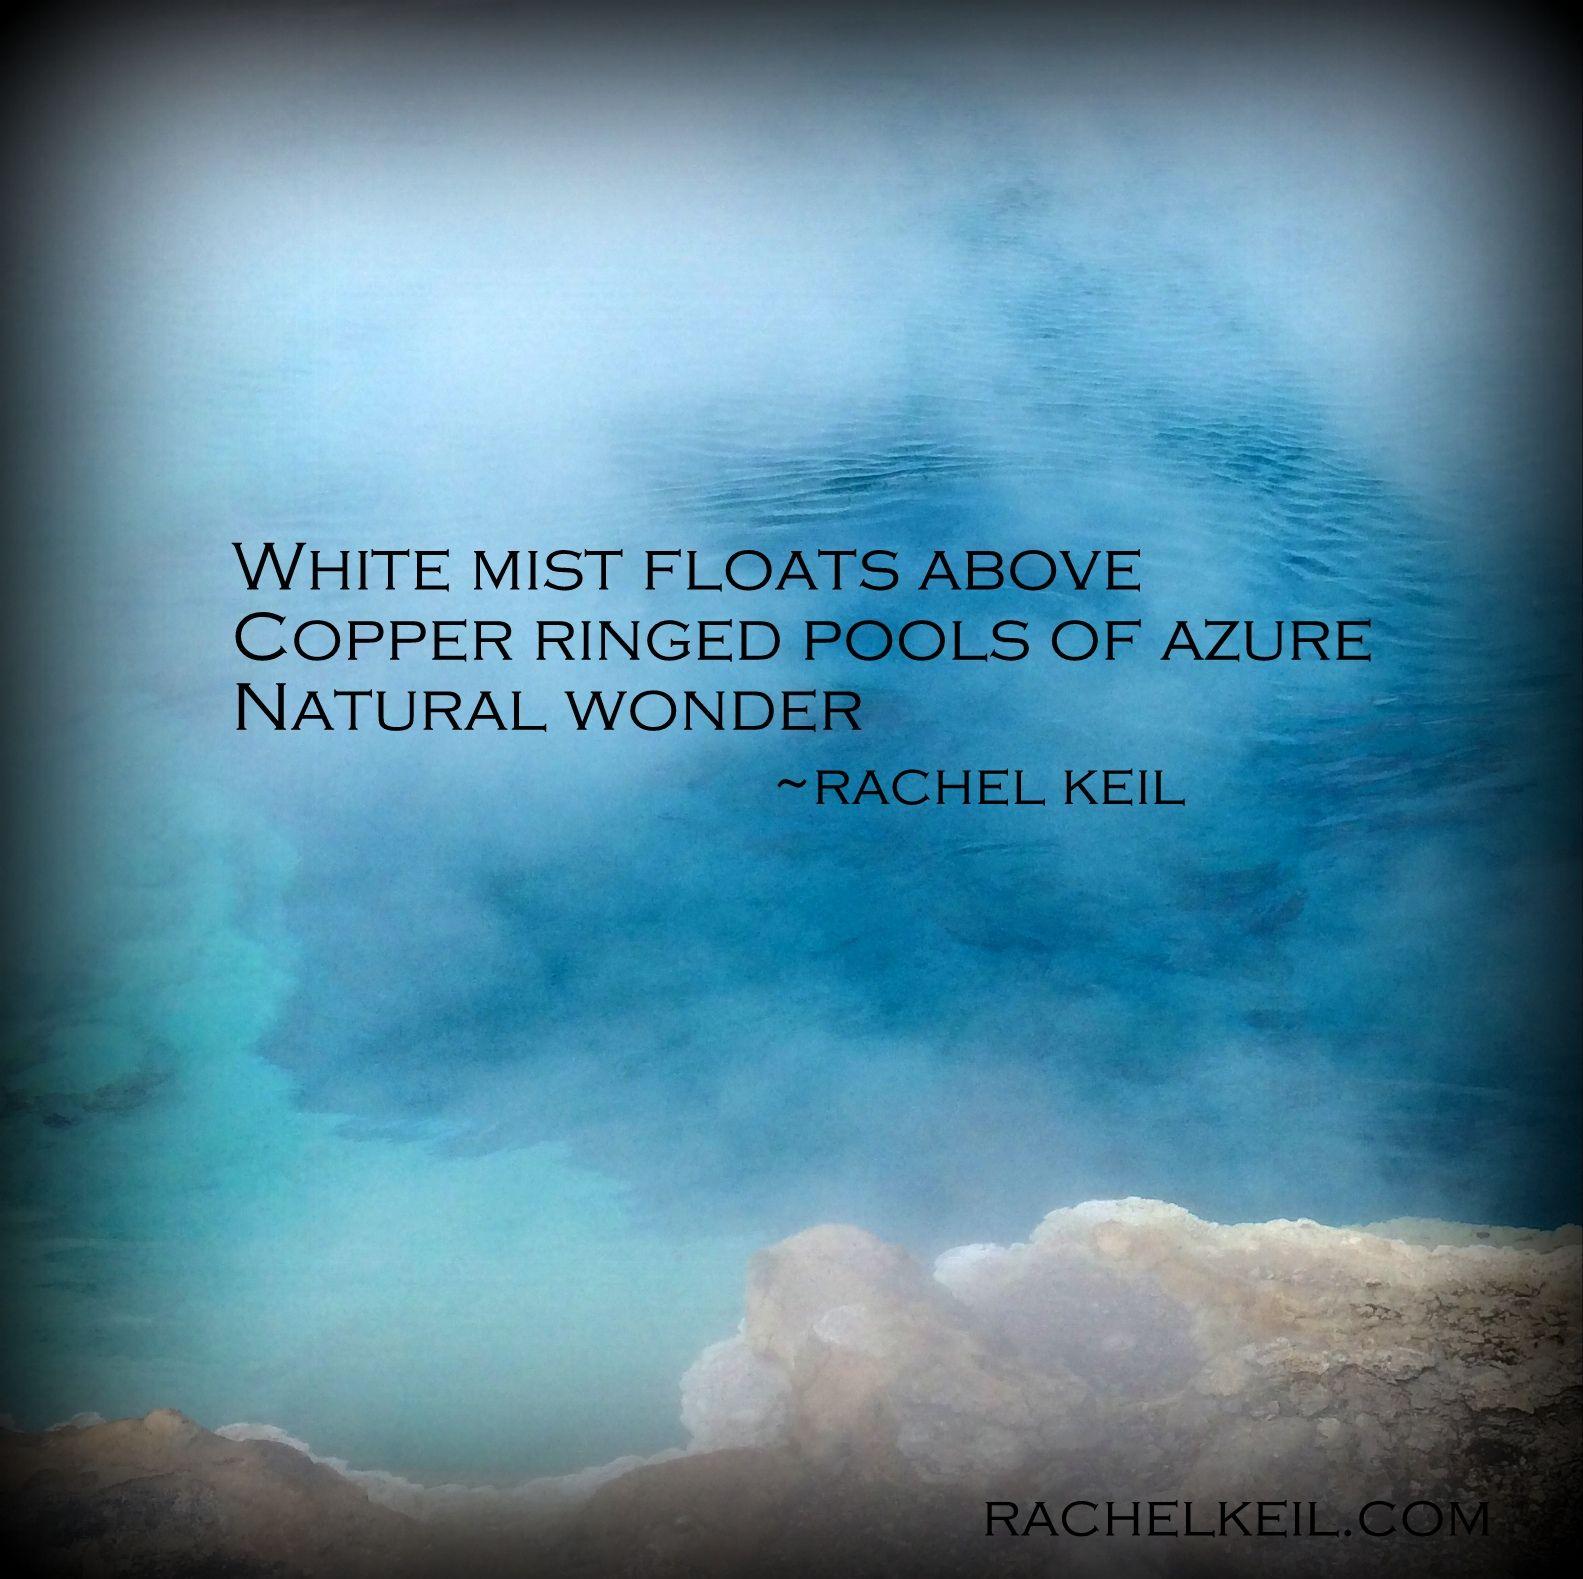 Visit the post for more. Natural wonders, Nature, Haiku